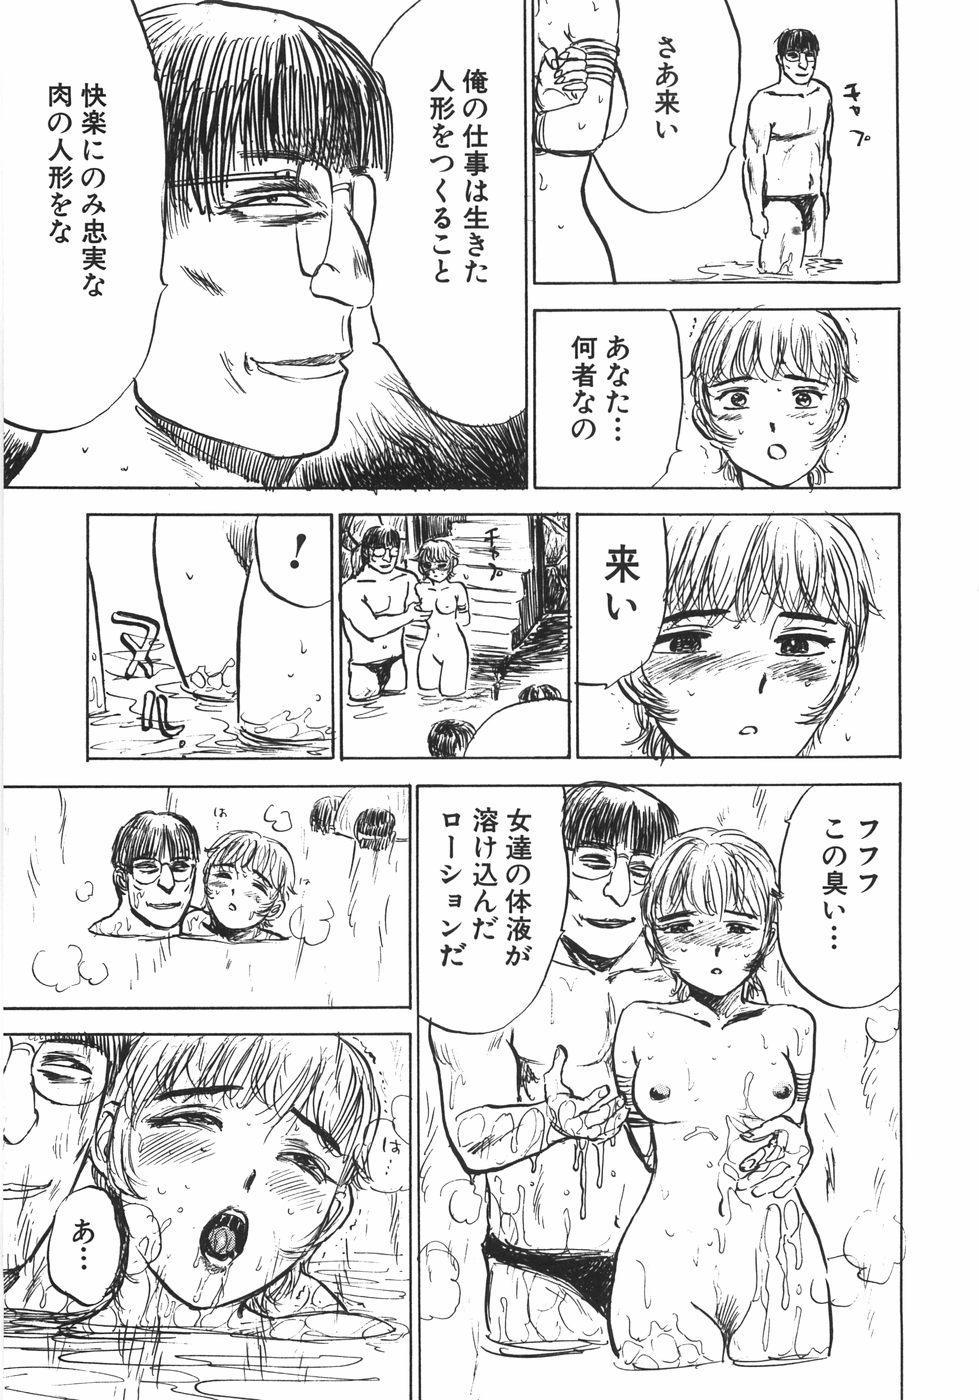 Ningyou no Yakata - The Doll House 99